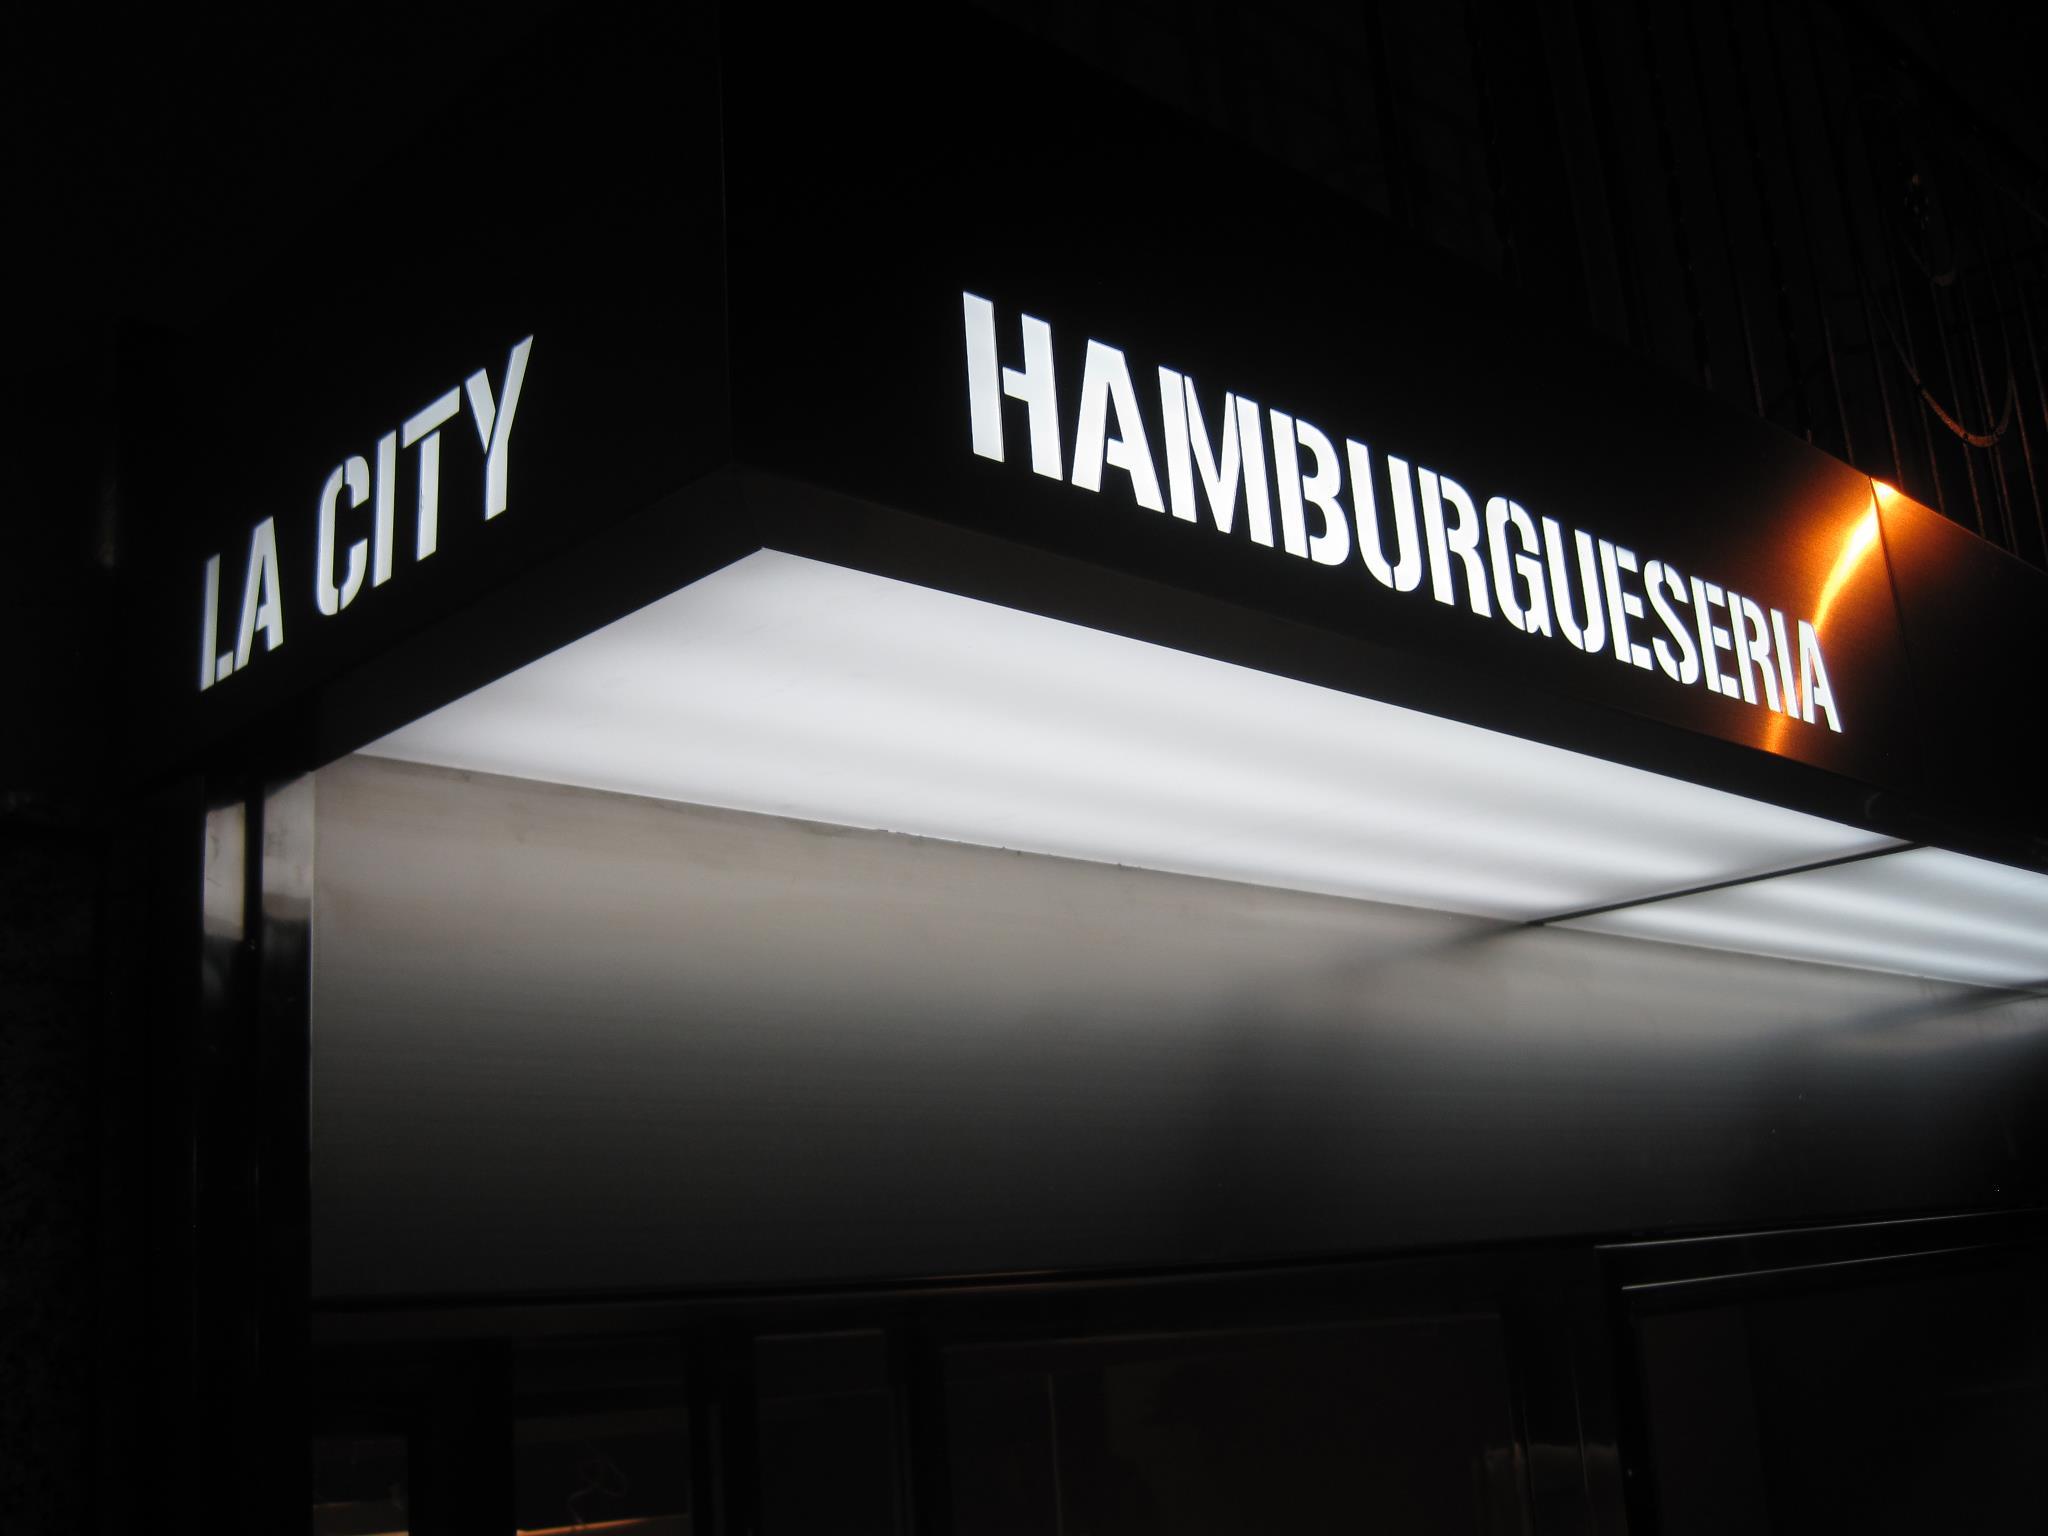 Hamburguesería La City